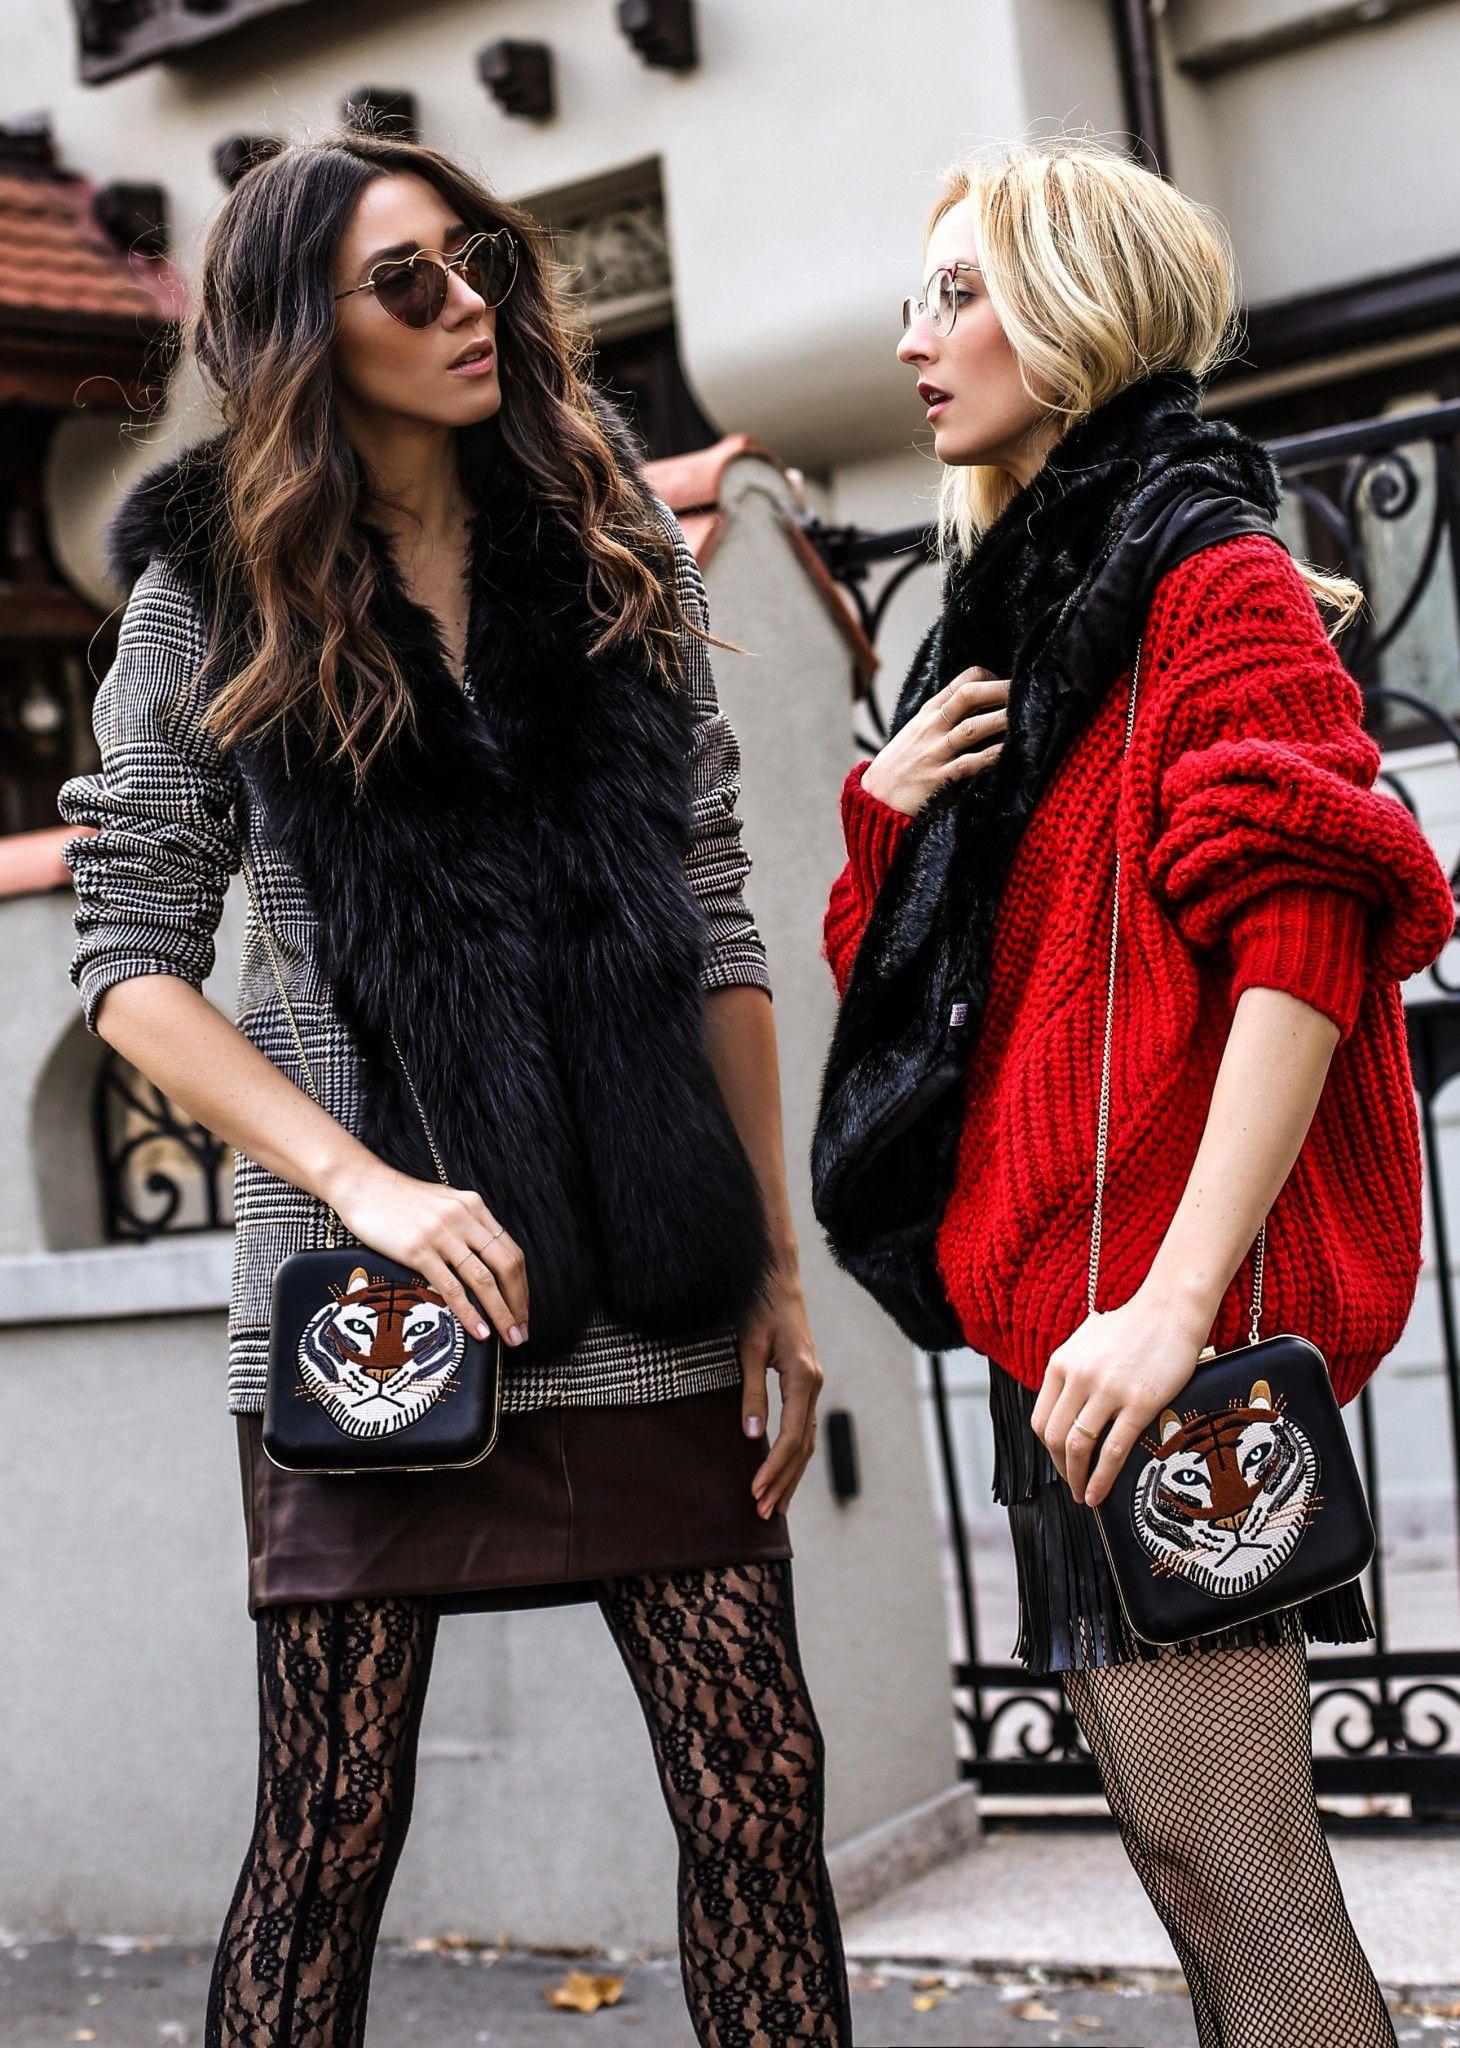 2black_friday_fabulous-muses_bibloo_winter_shopping